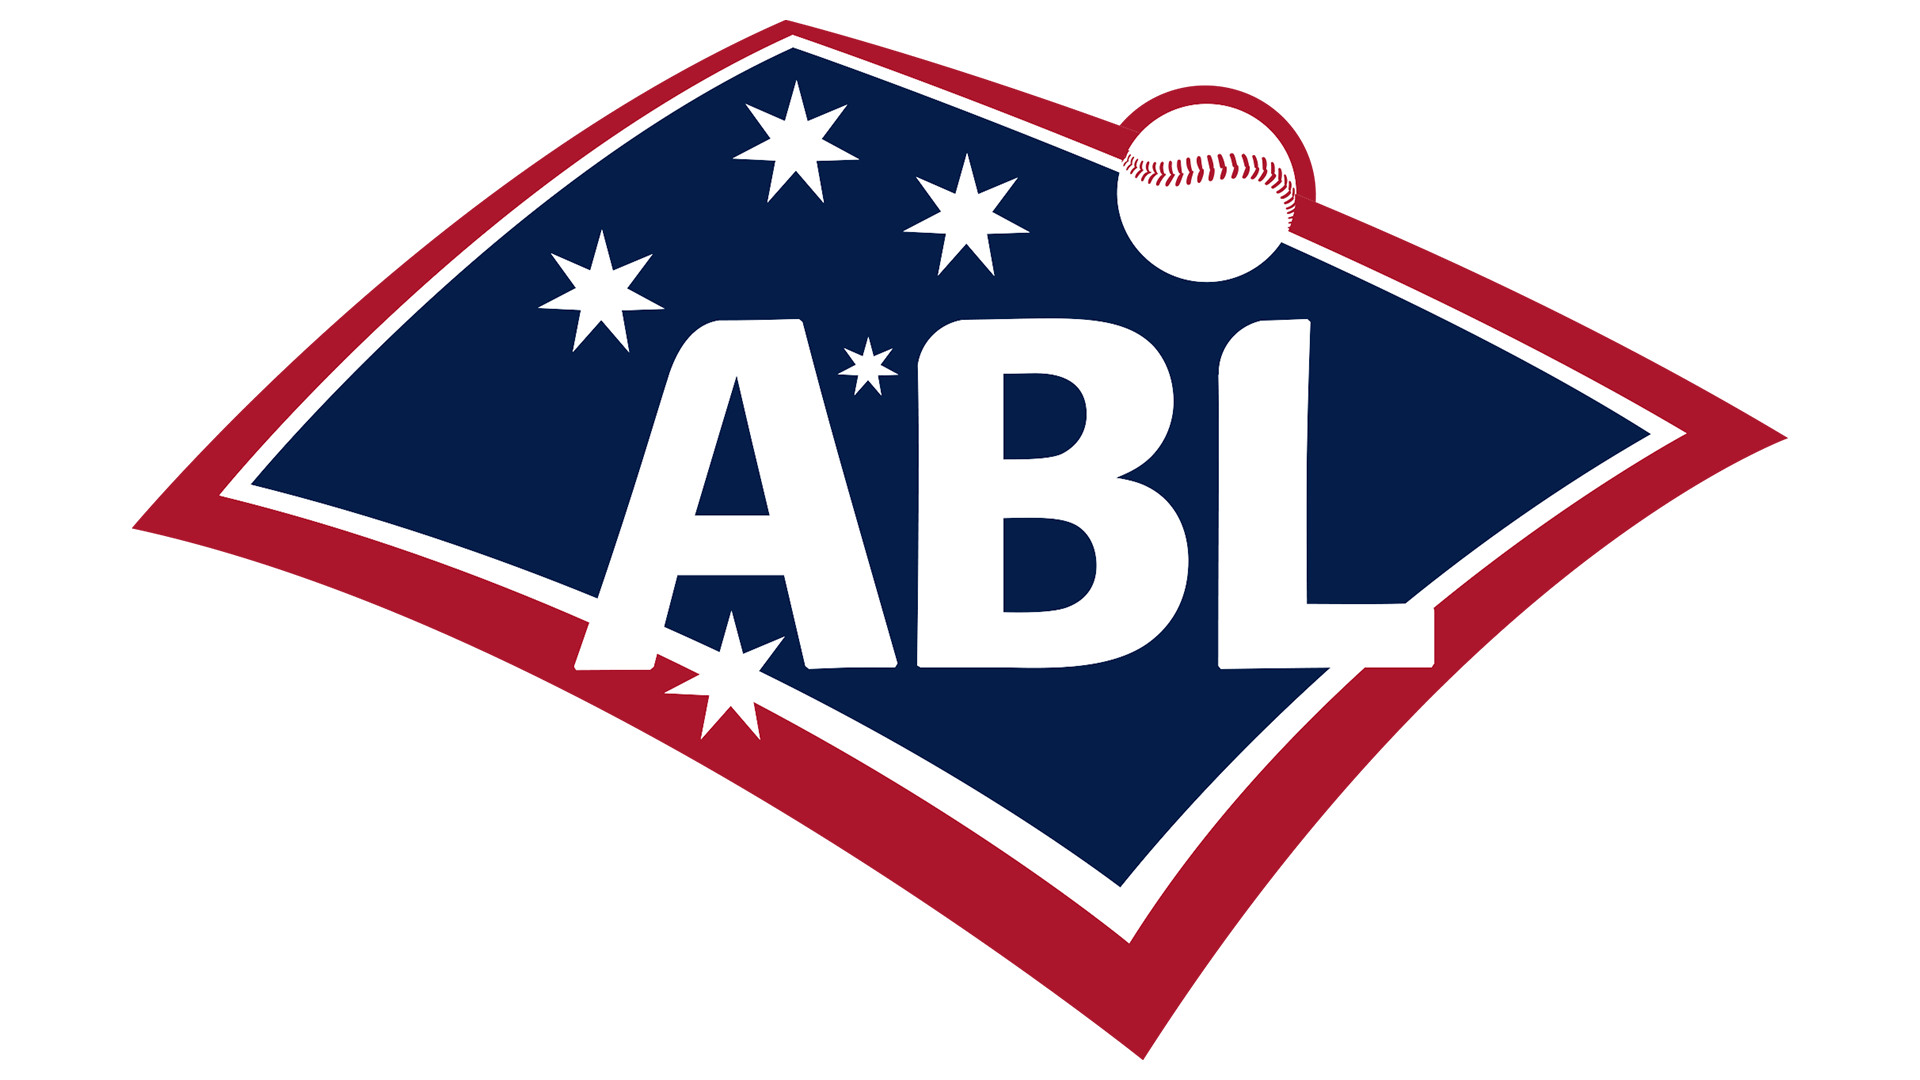 Australian Baseball League logo and symbol, meaning ...